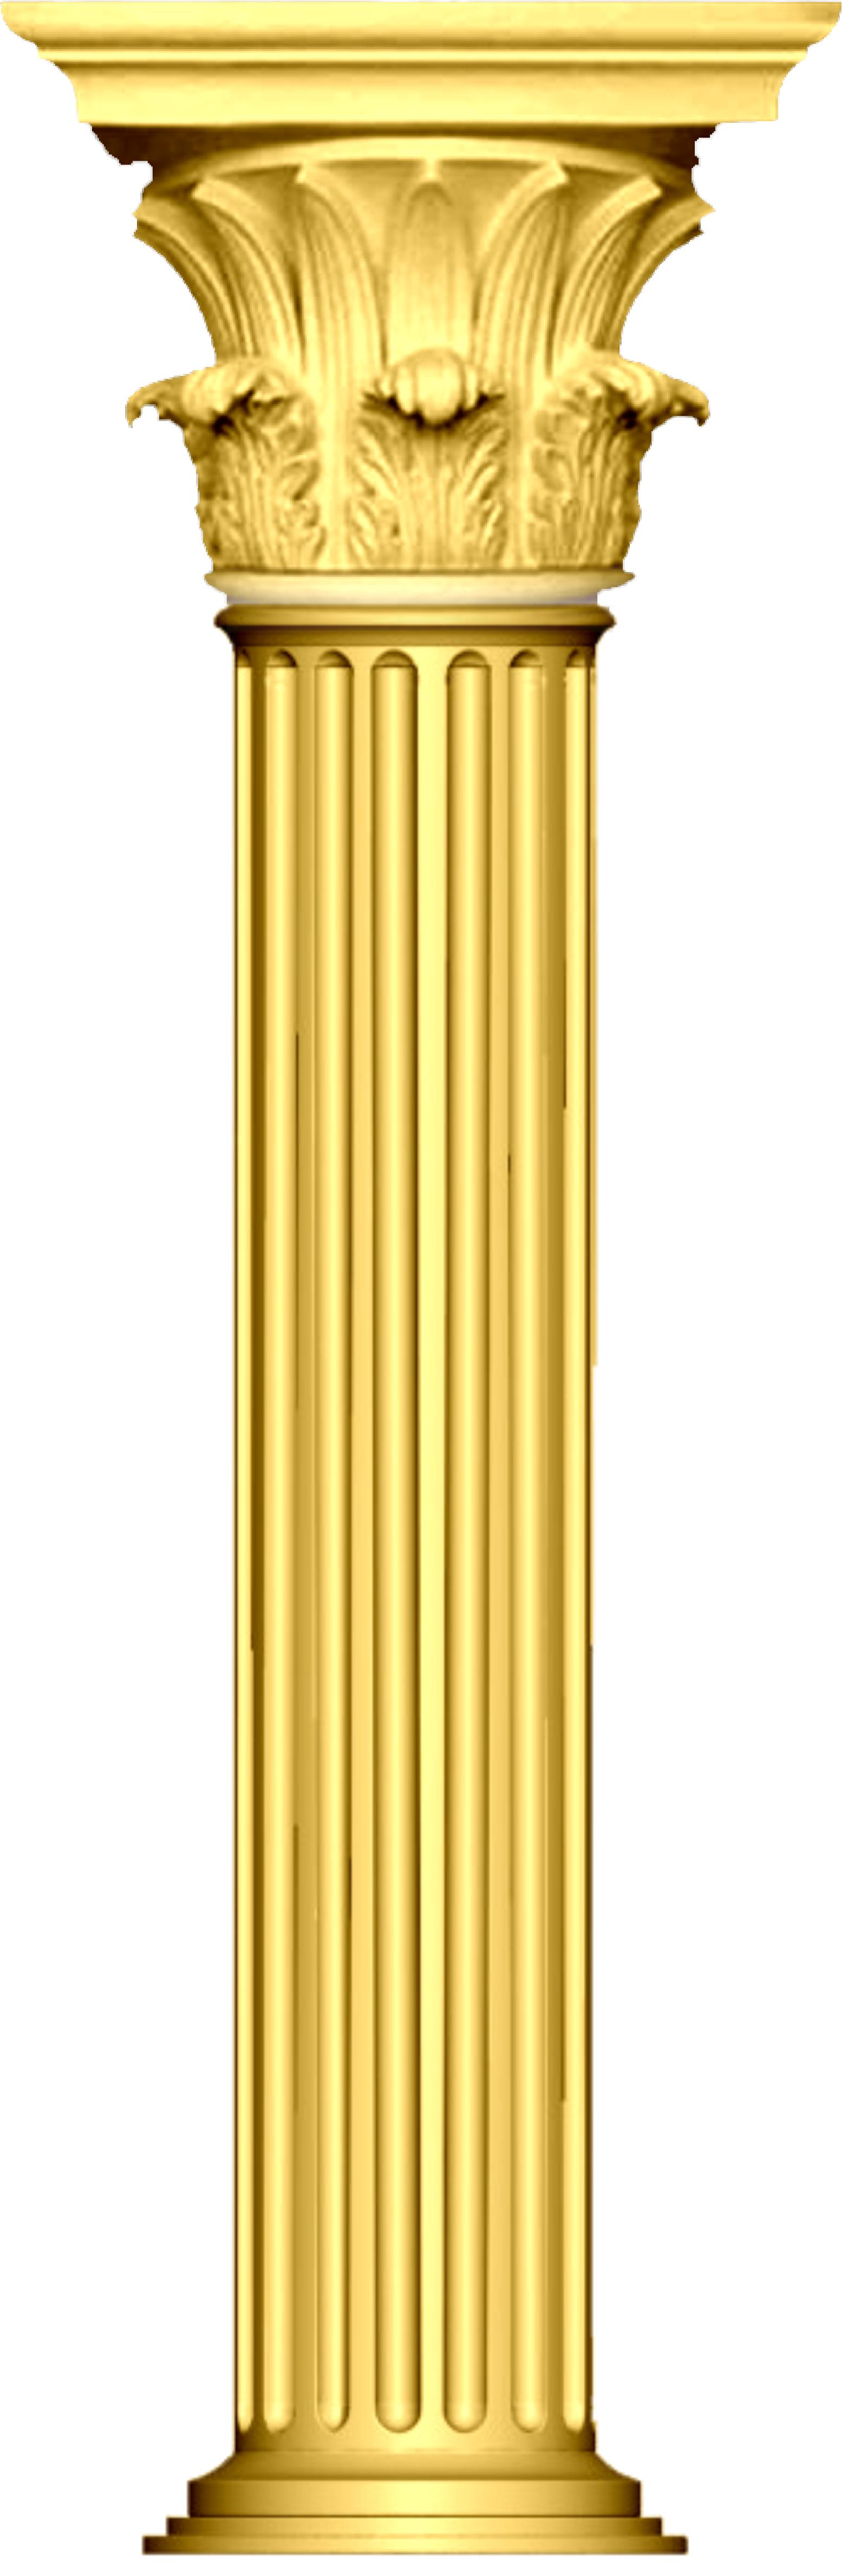 Design this Greek basic pillar